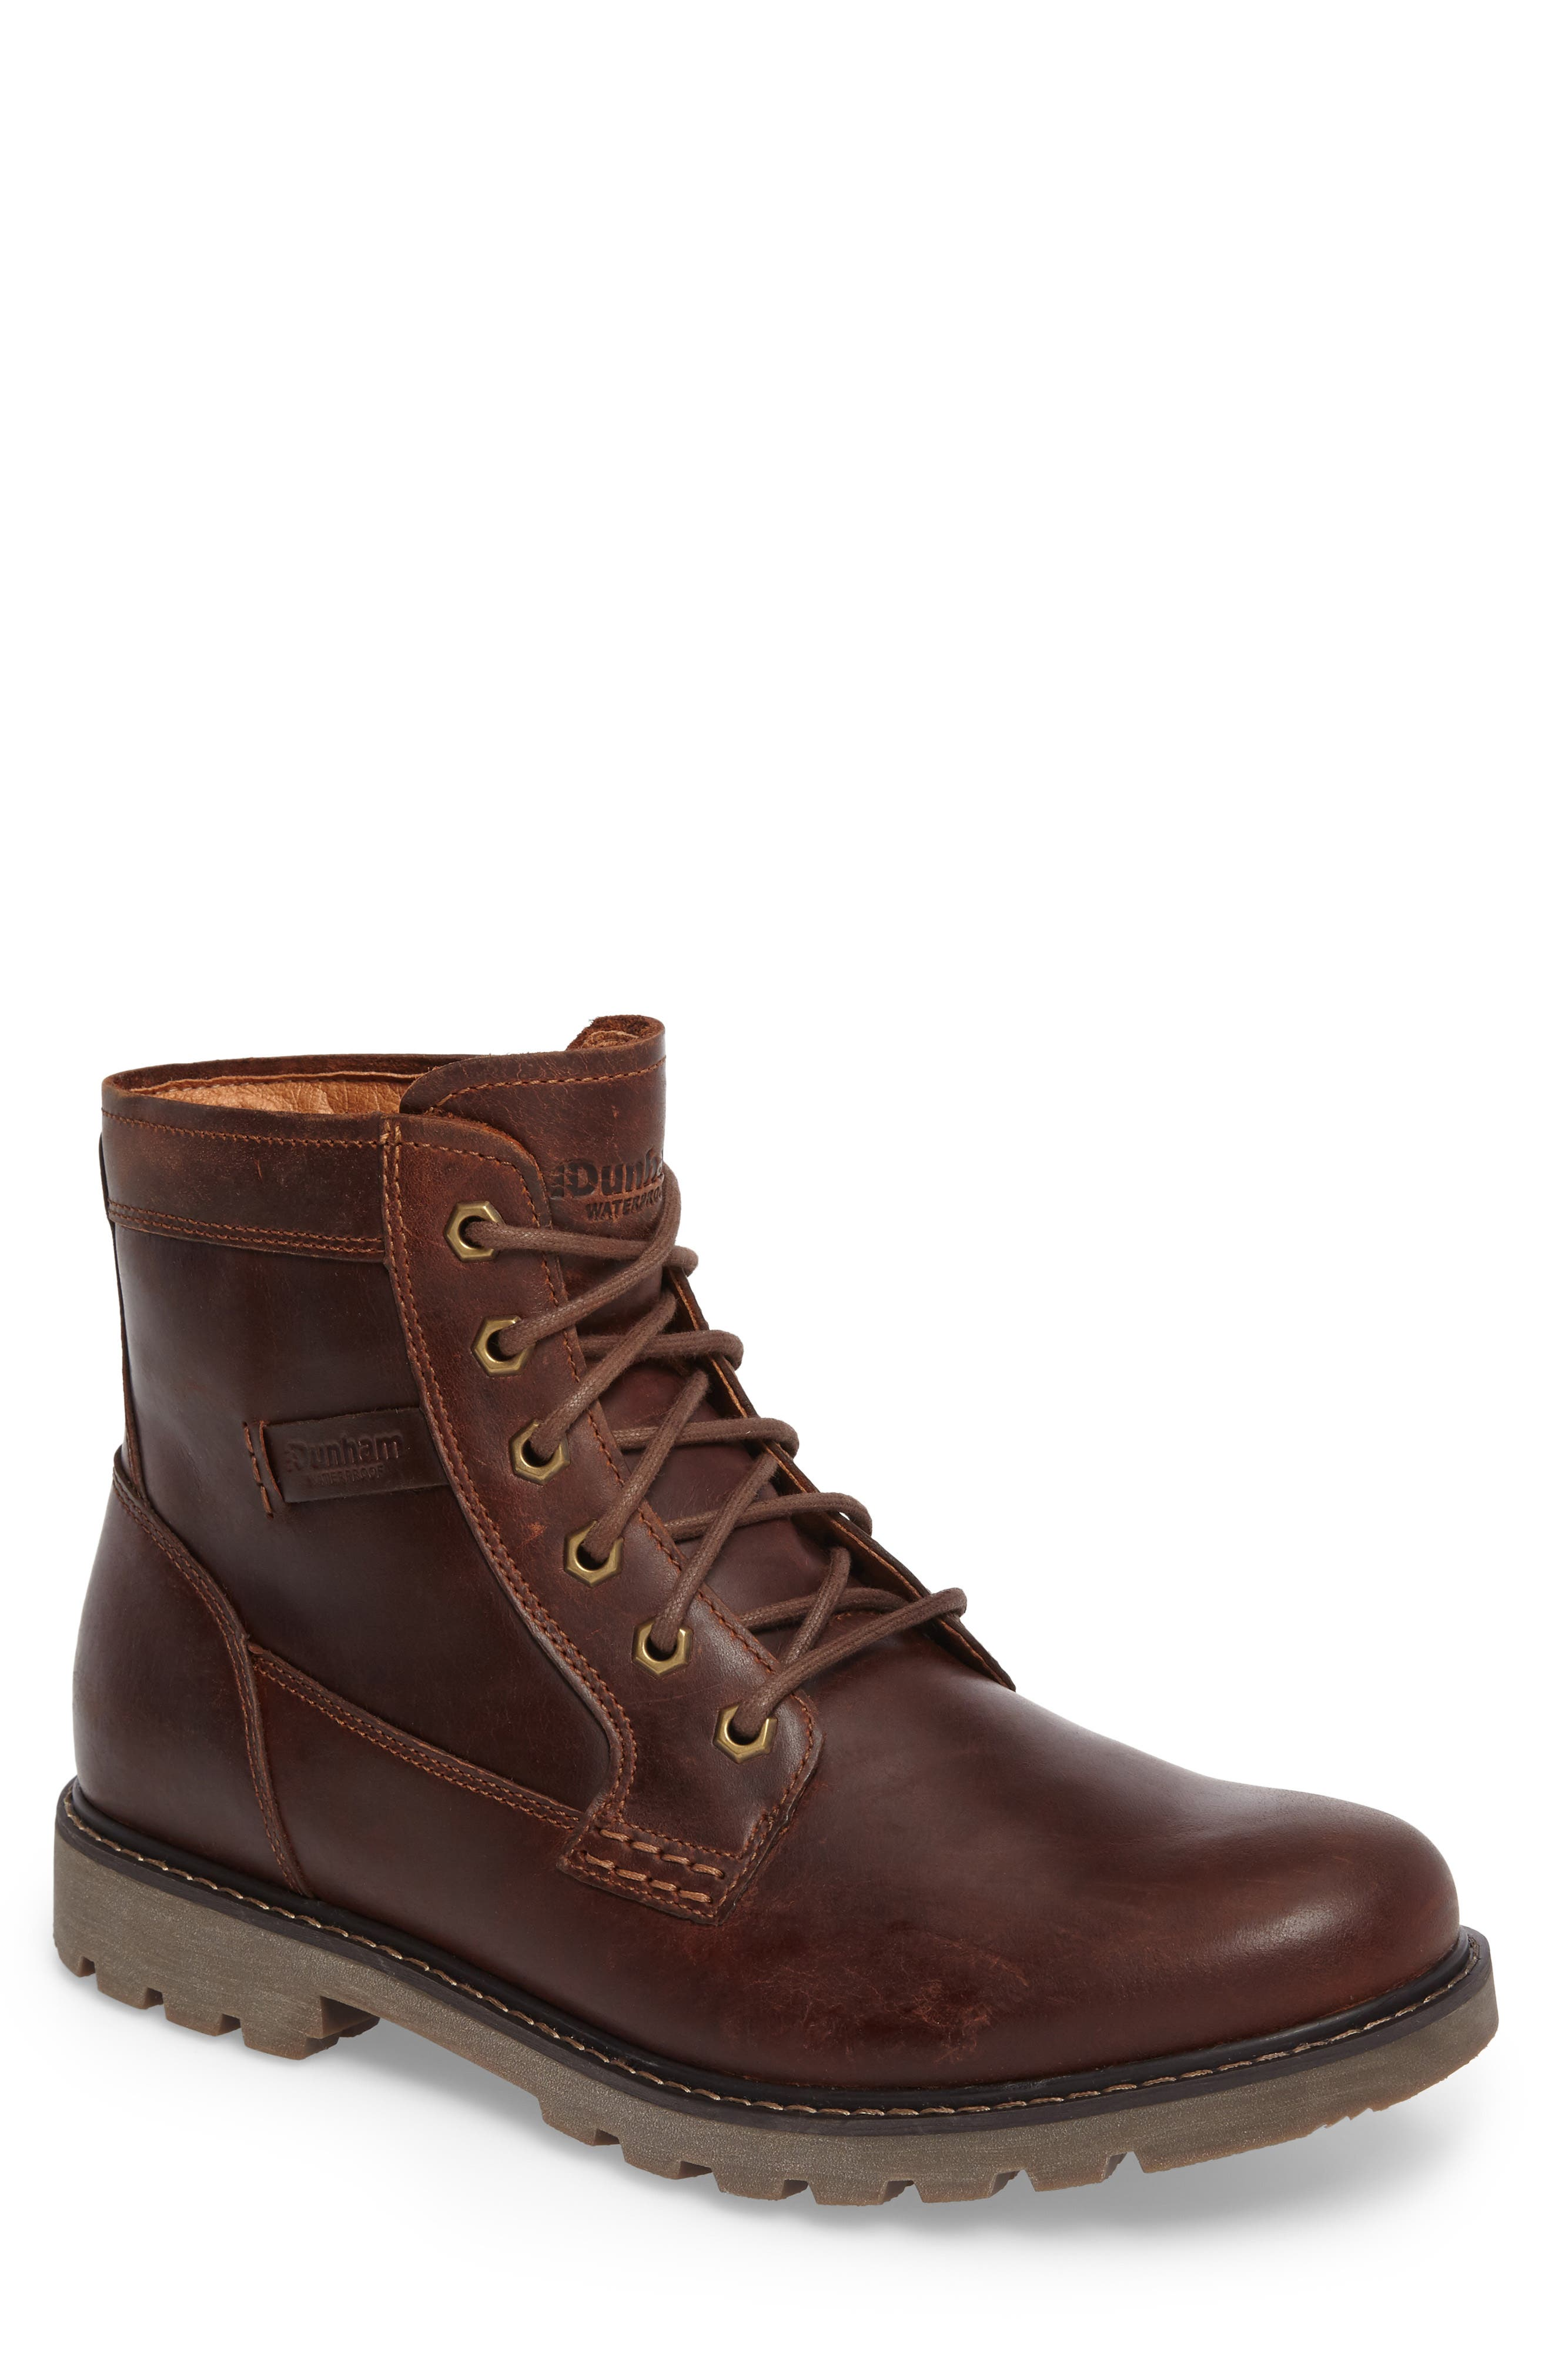 Royalton Plain Toe Boot,                         Main,                         color, BROWN